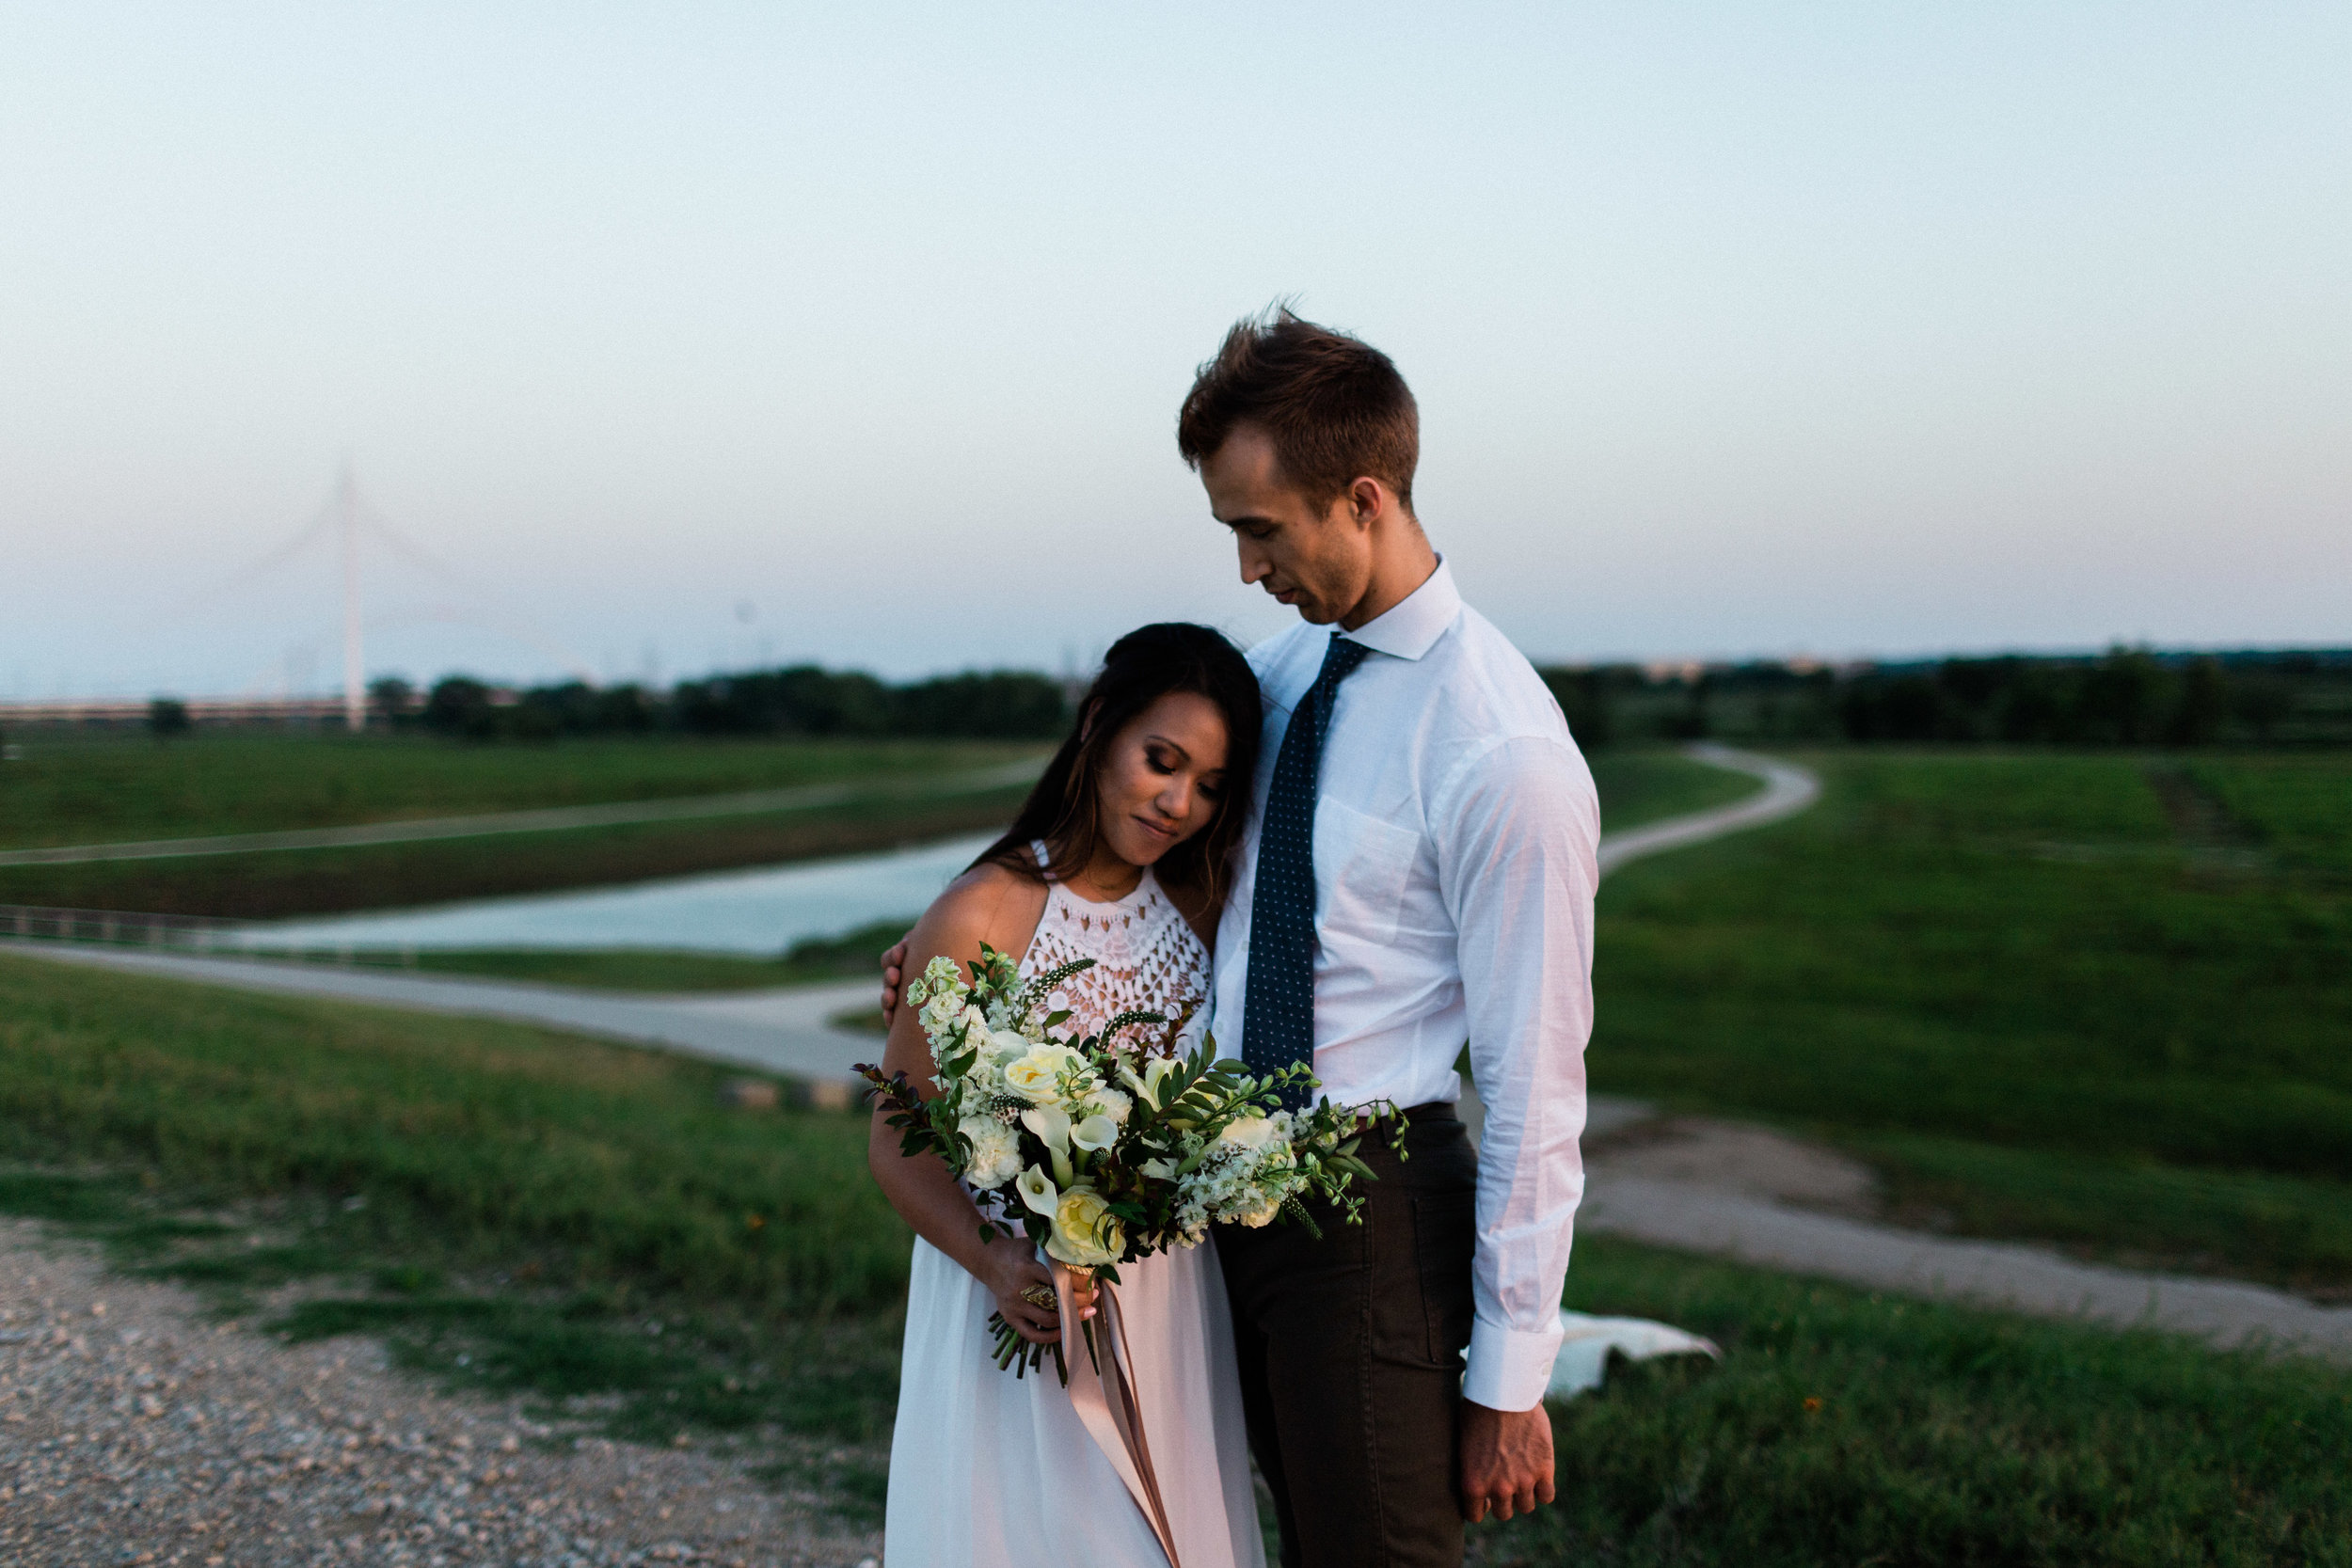 Dallas small wedding inspiration (23 of 24).jpg